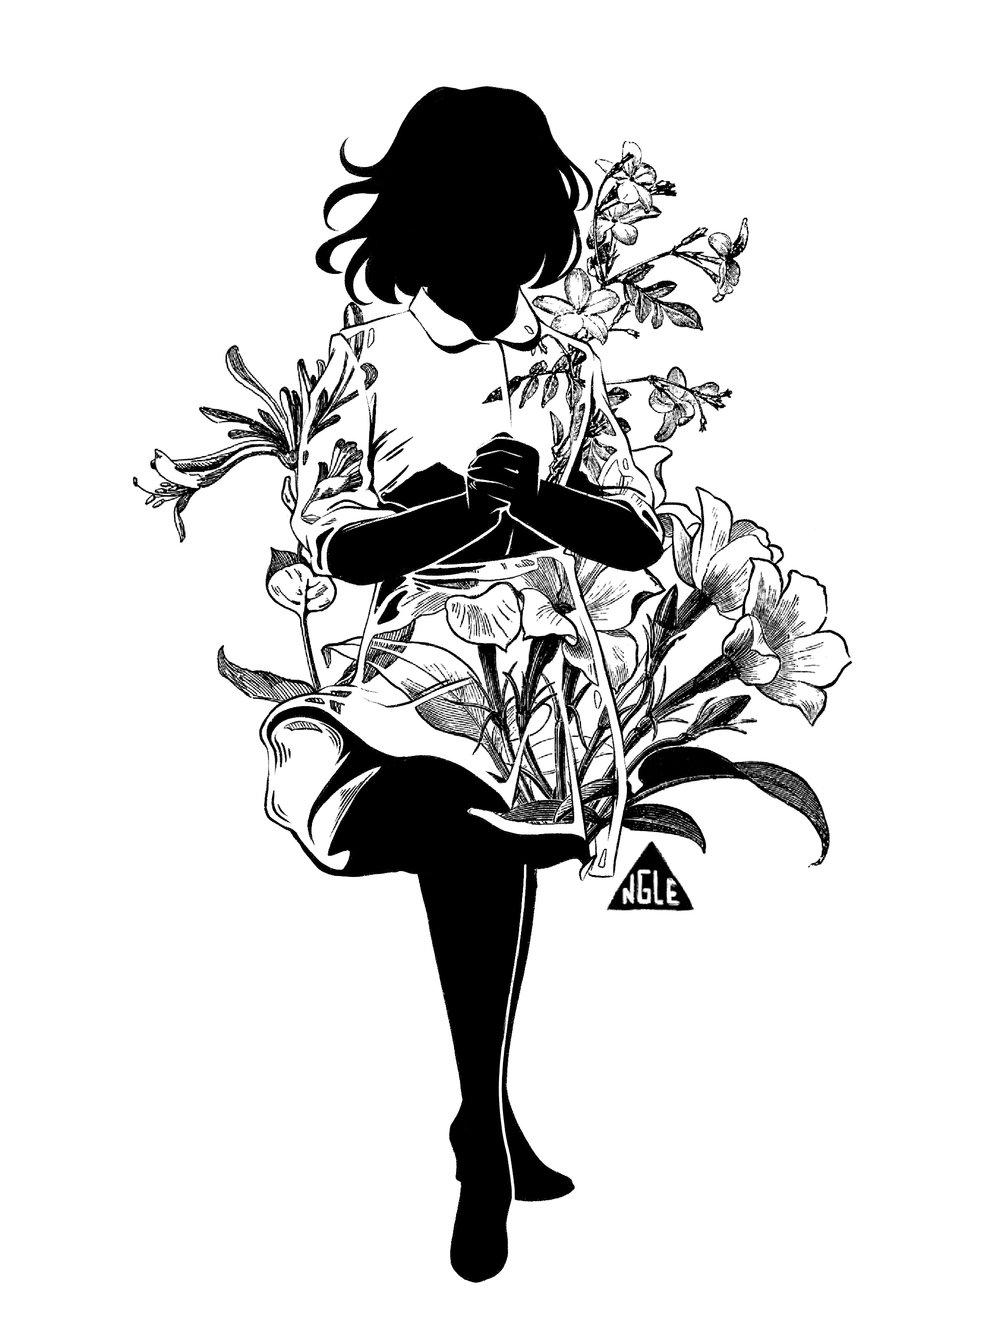 Untitled_Artwork (5).jpg